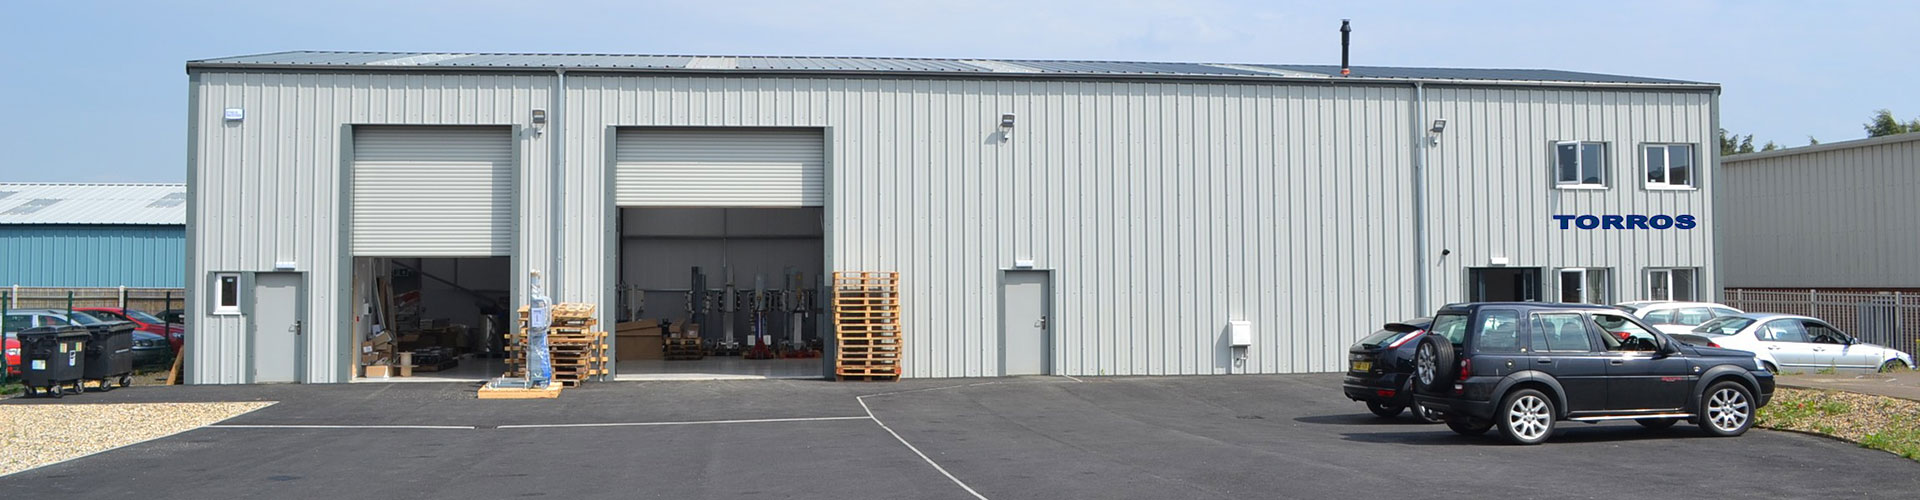 Torros Ltd Wymans Way Fakenham Industrial Estate Fakenham NR21 8NT